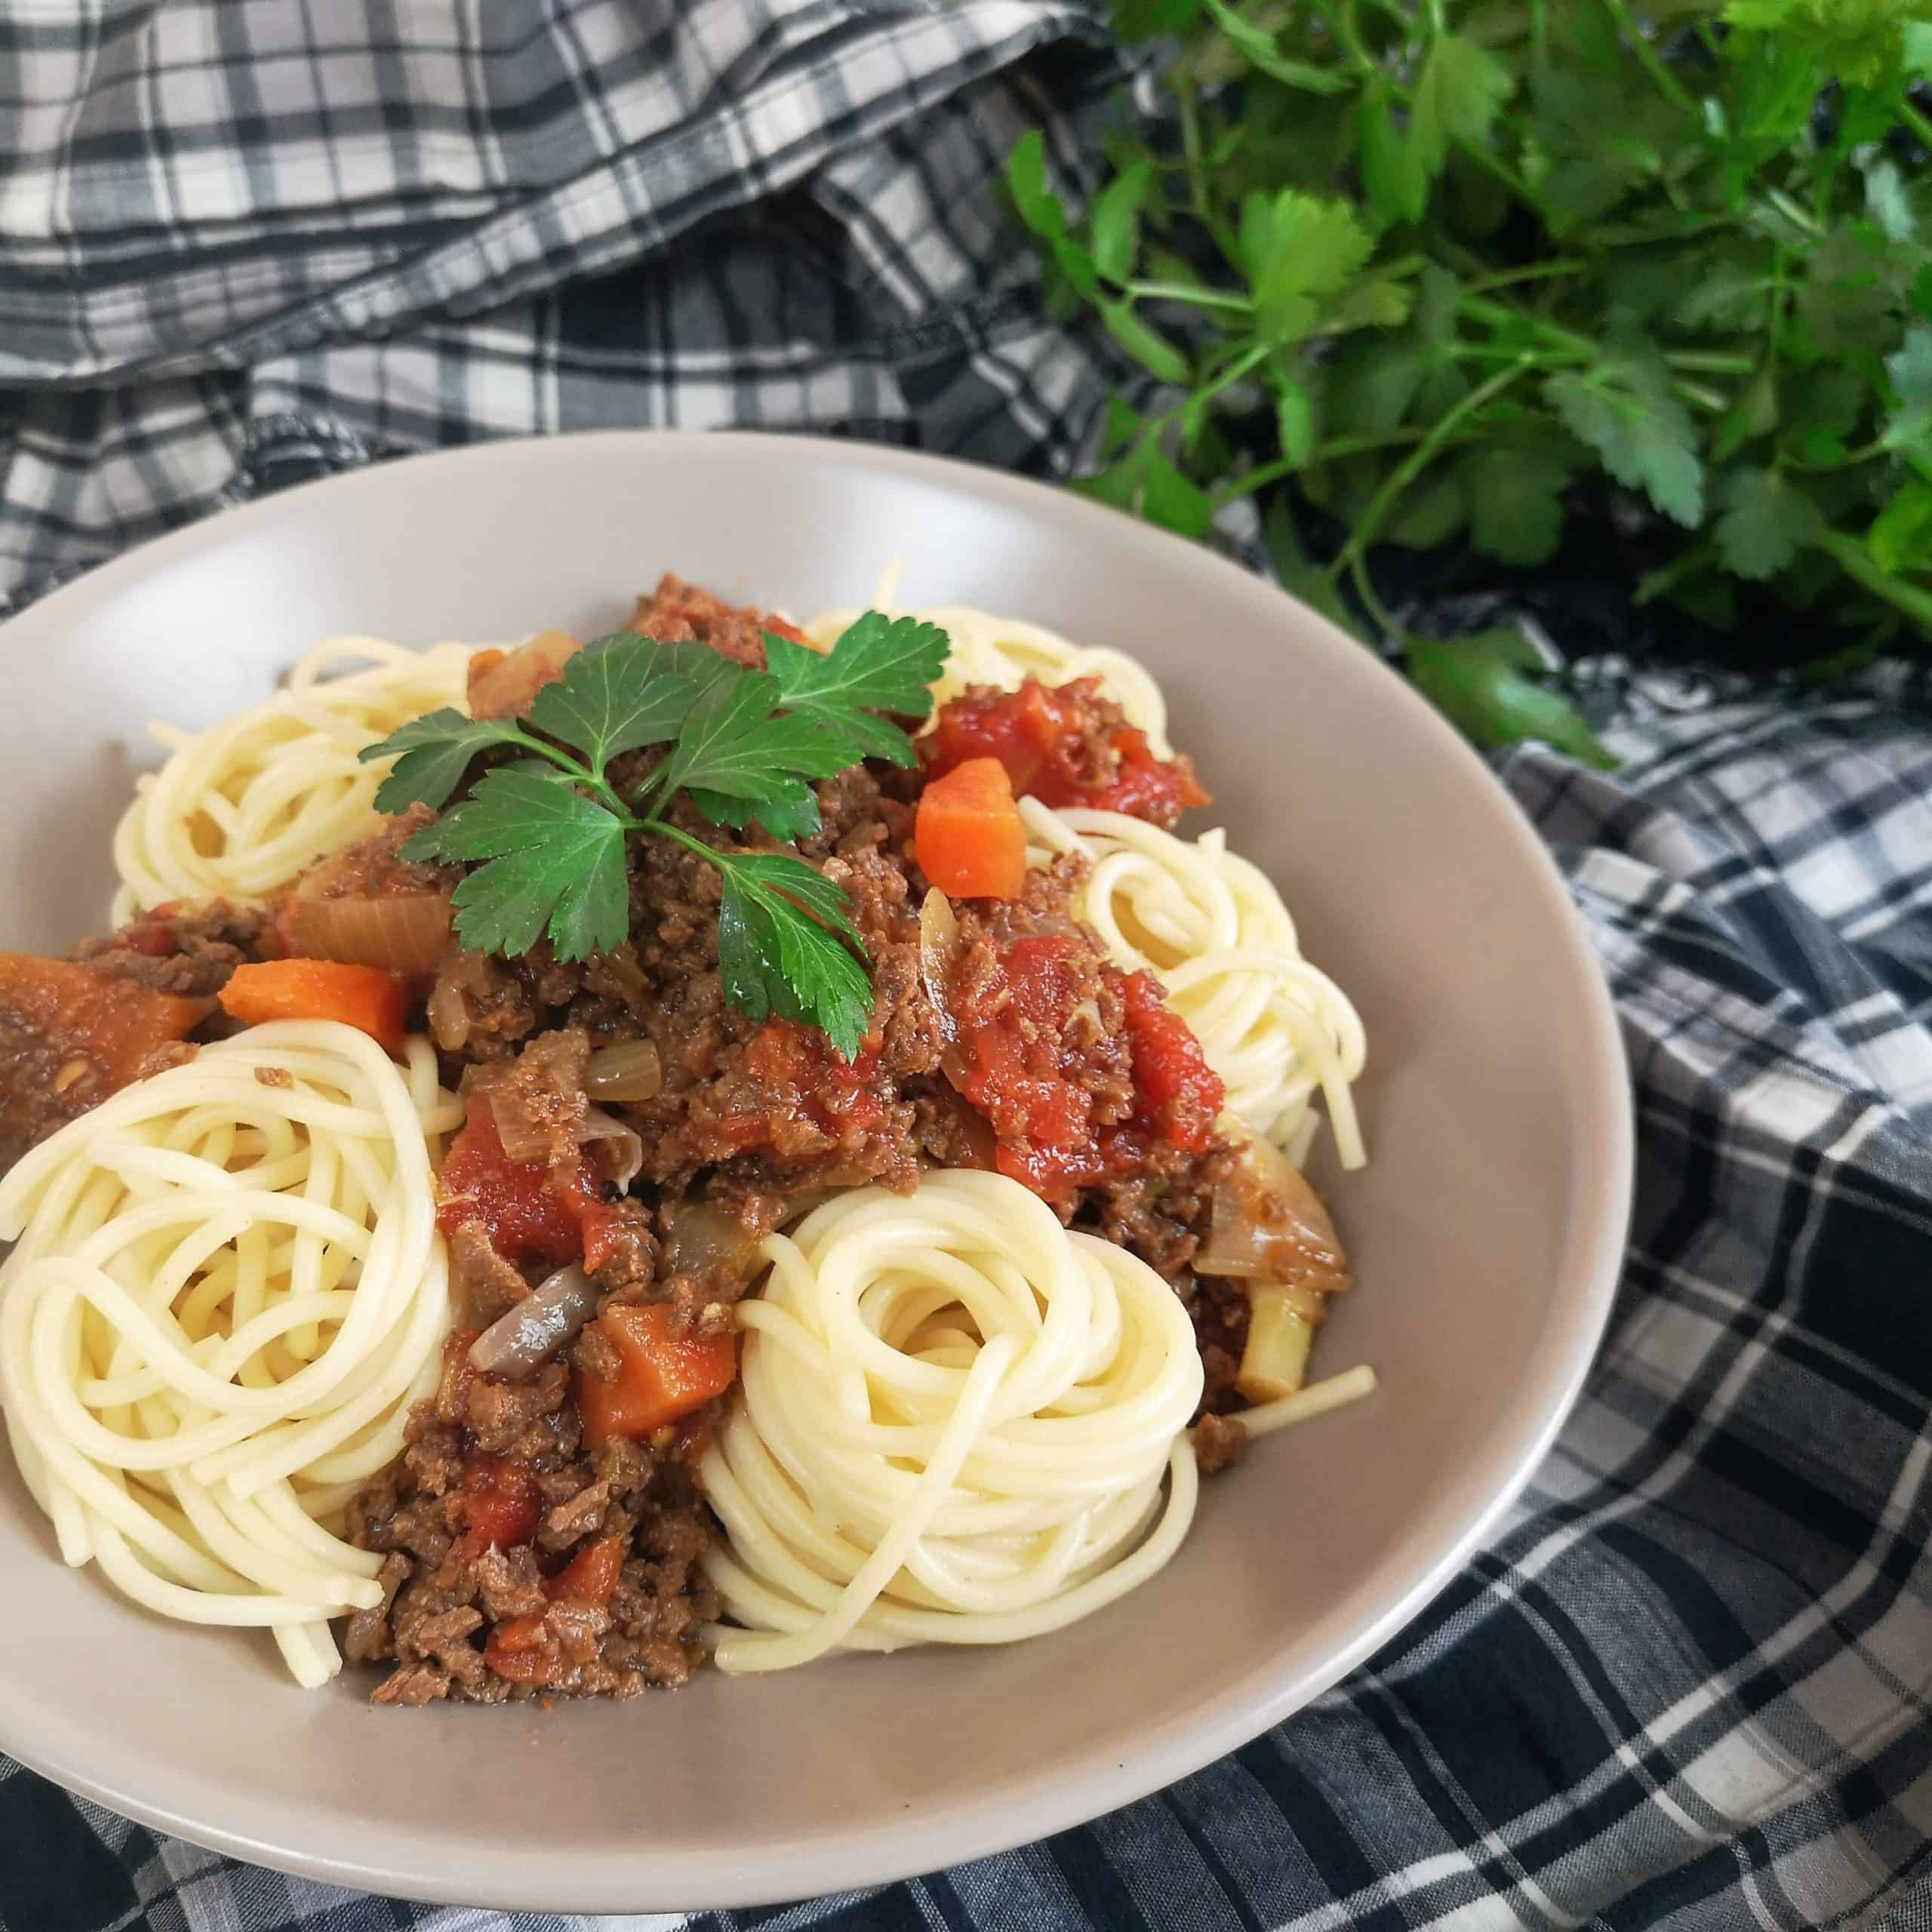 Spaghetti bolognaise vegan aux protéines de soja (PST)